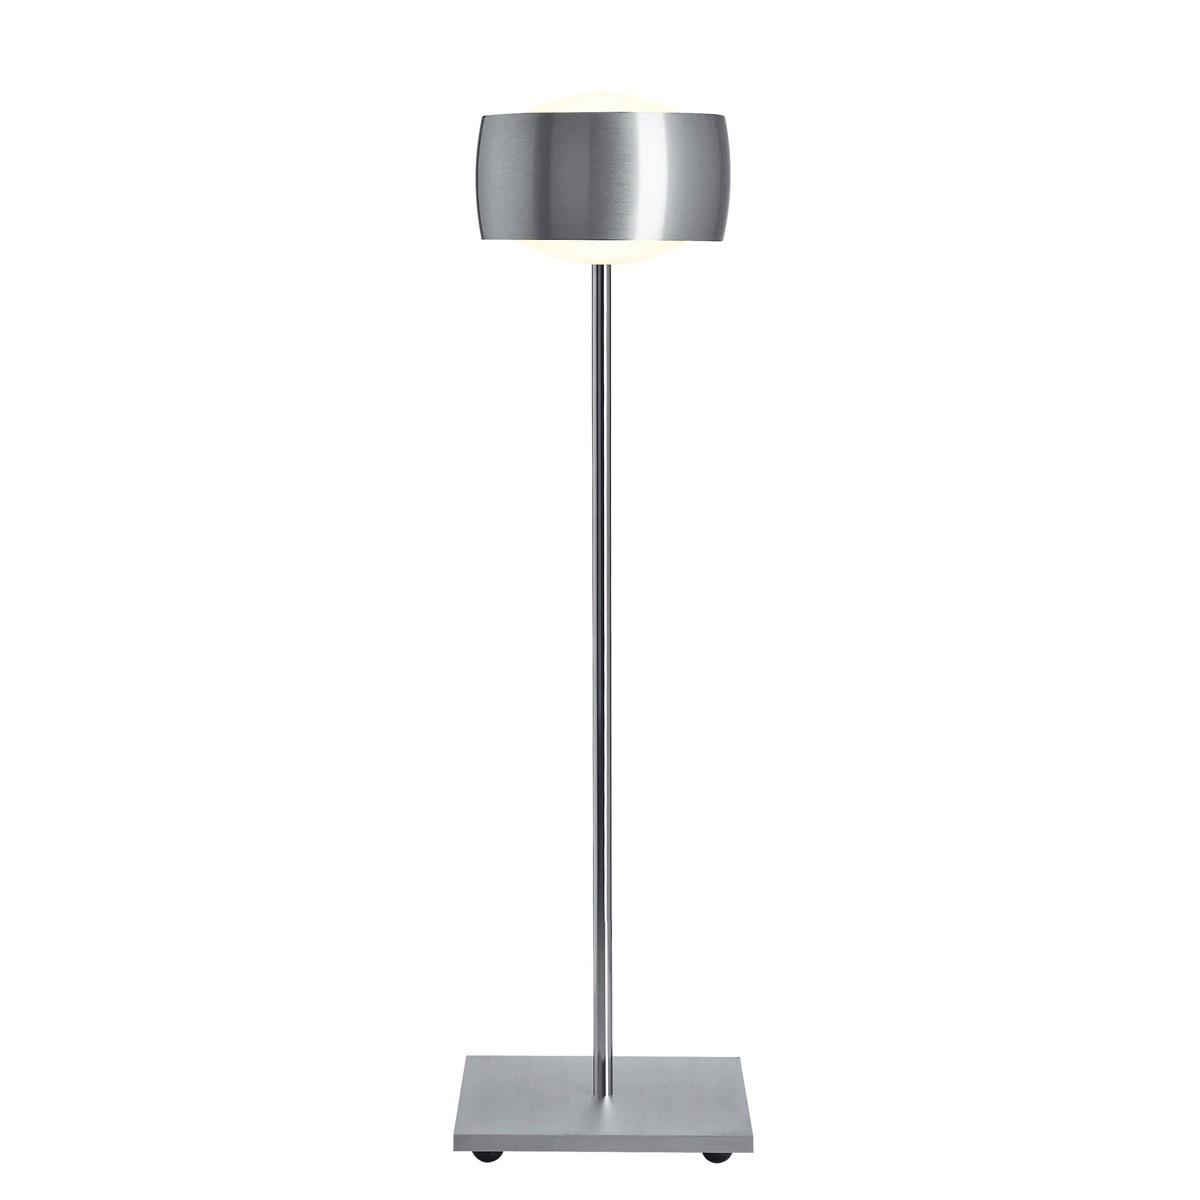 Oligo Grace LED Tischleuchte, Aluminium gebürstet